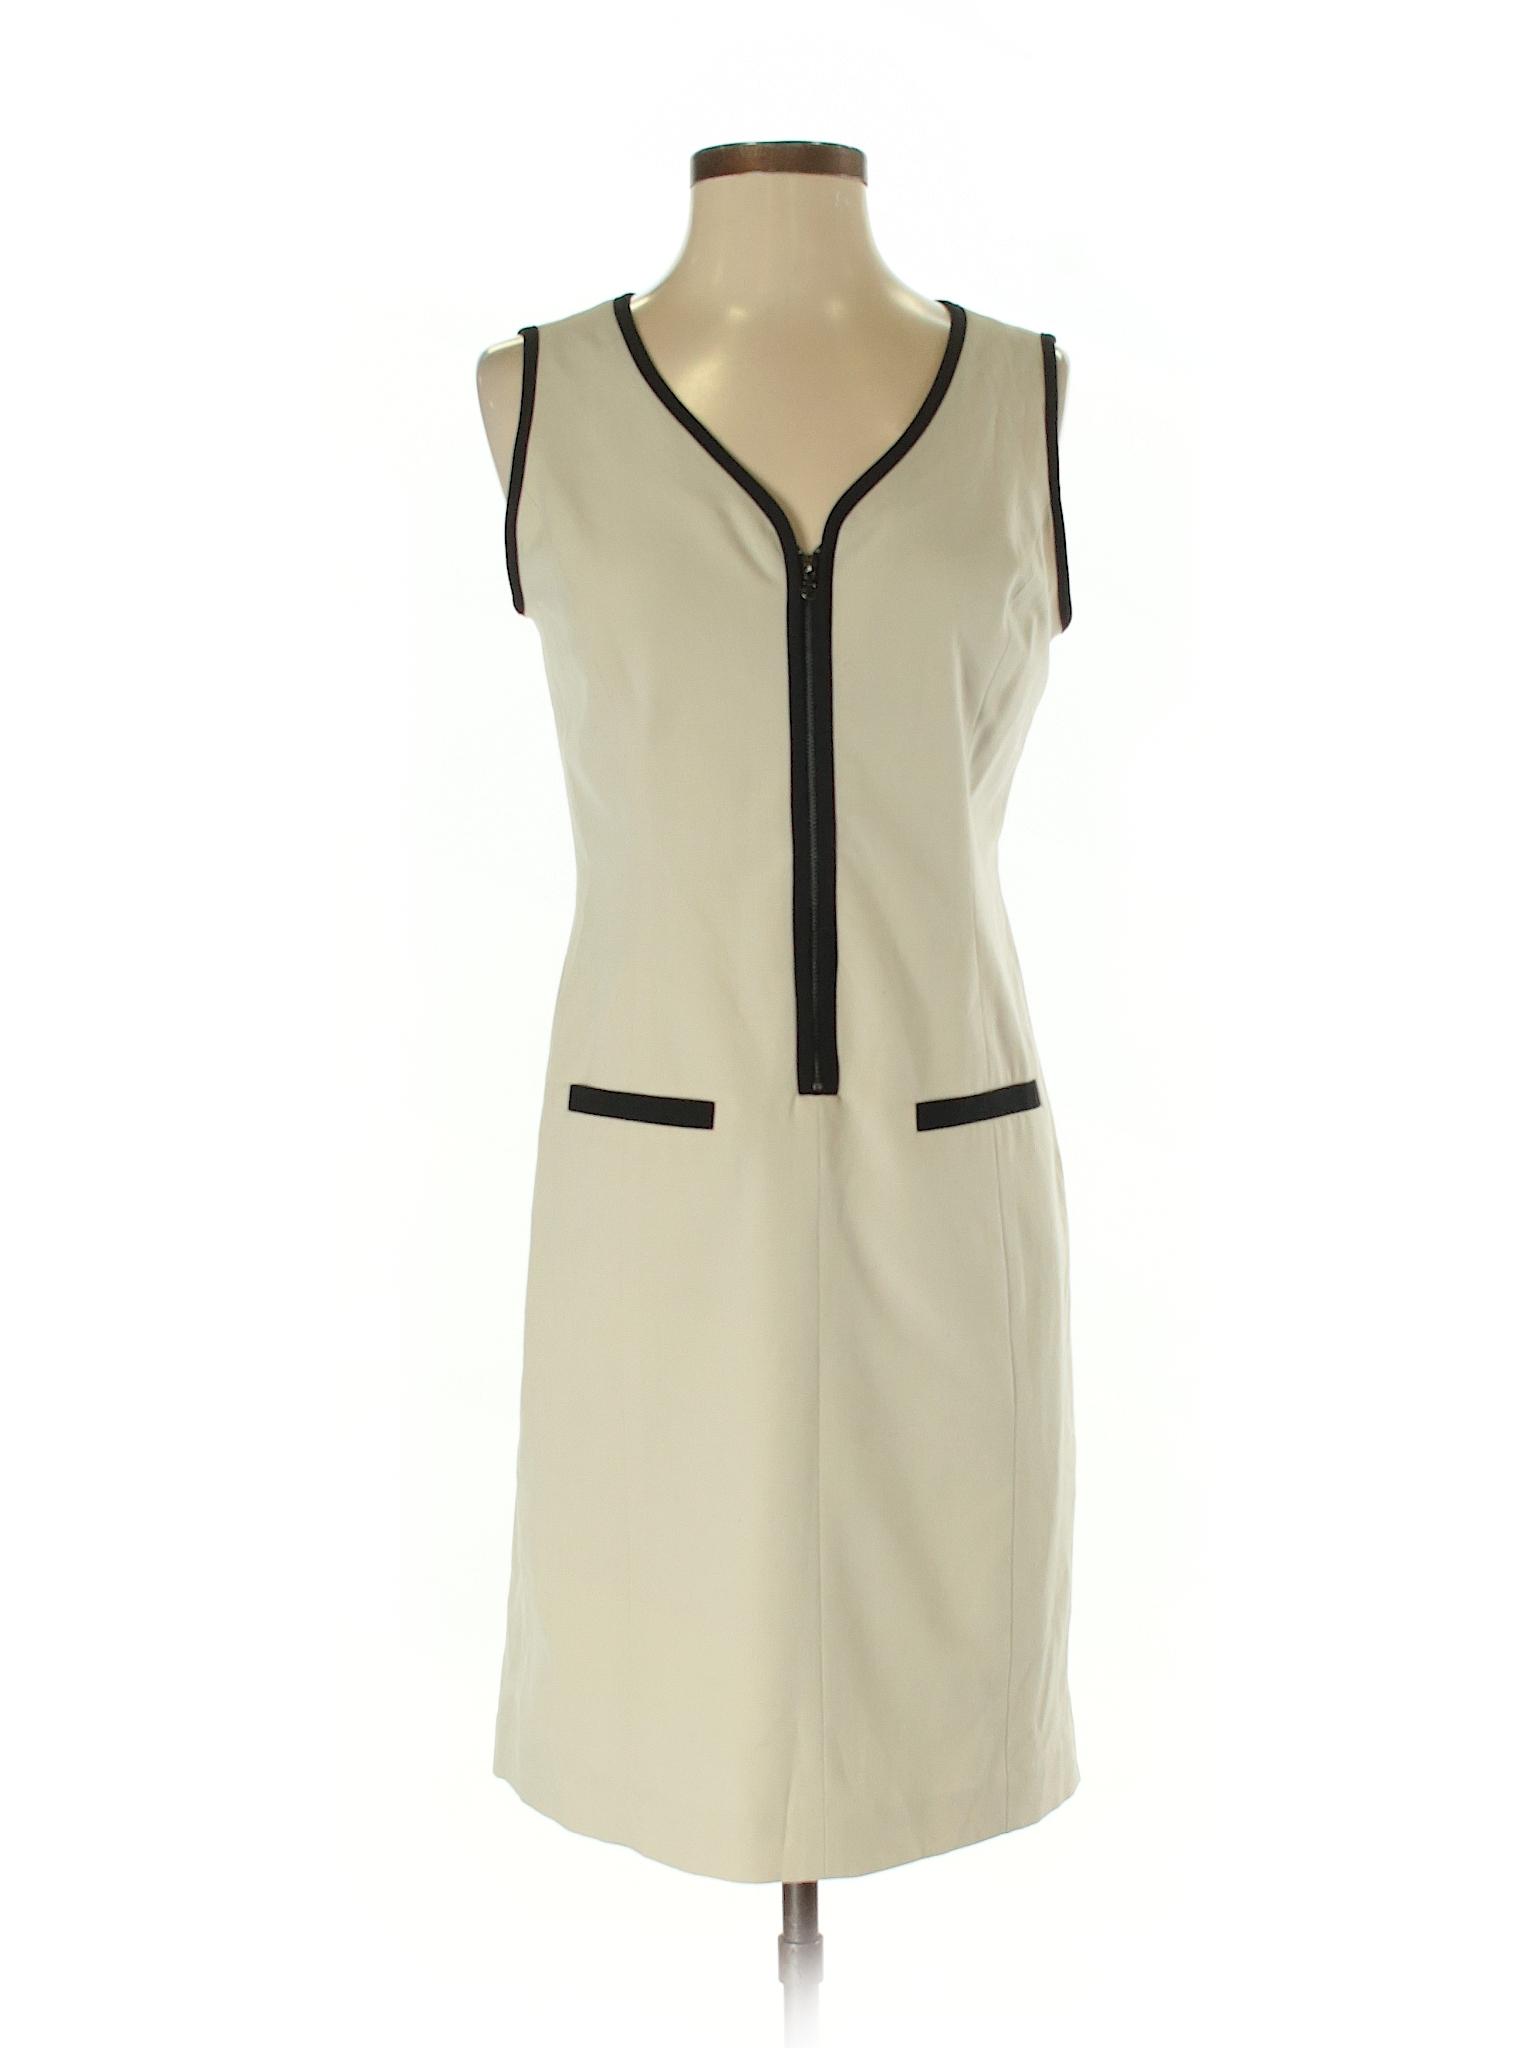 Selling Nine Nine Casual West Selling West Casual Dress vwE8qx